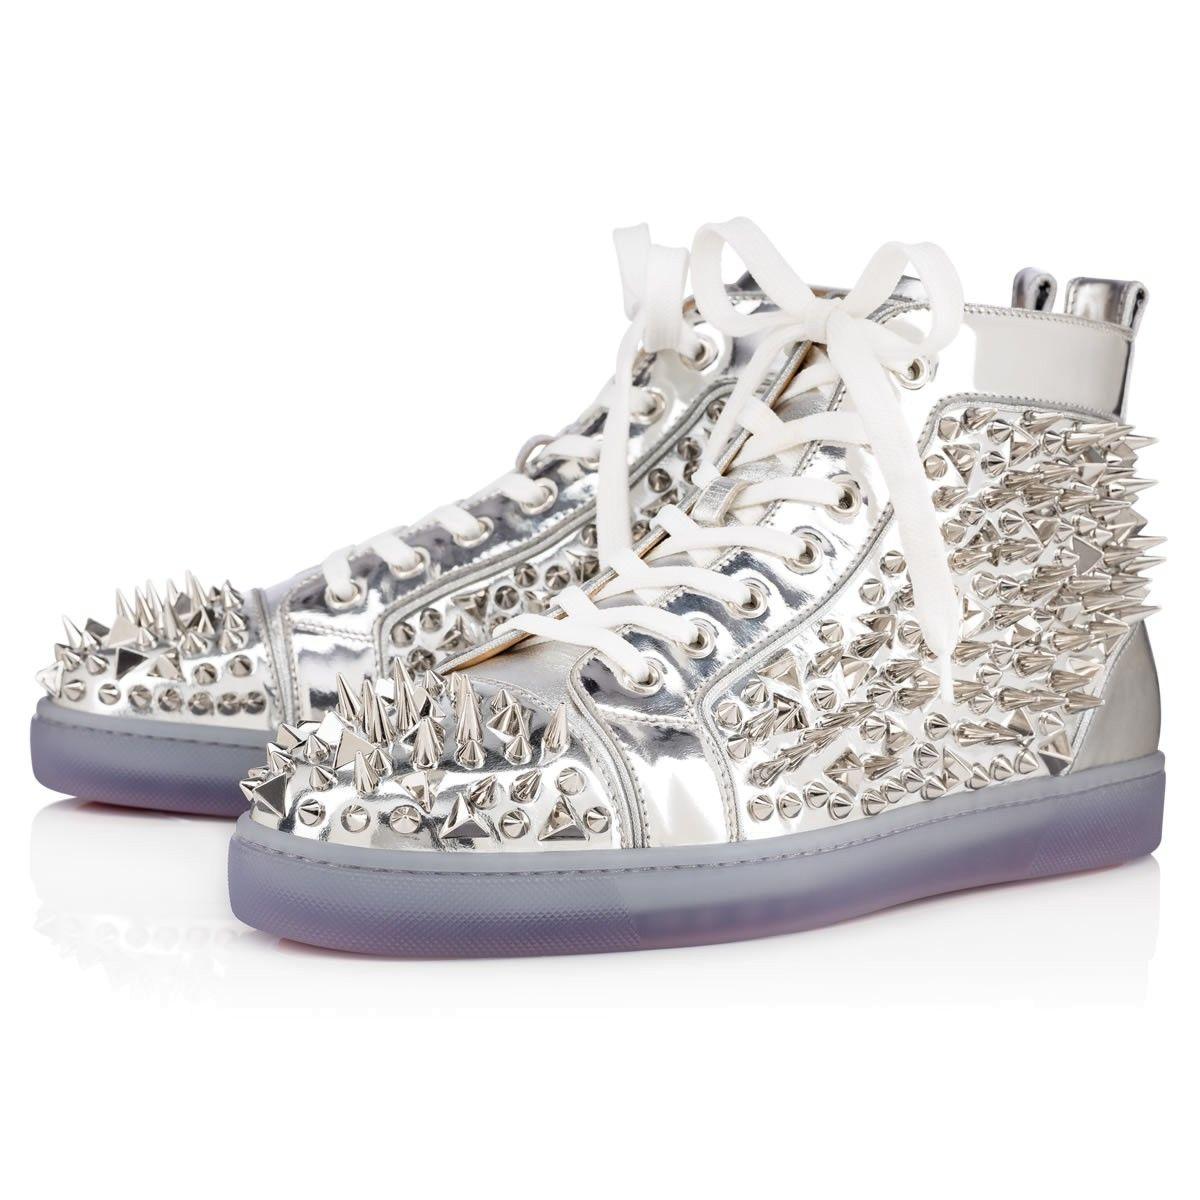 f2362b9334b CHRISTIAN LOUBOUTIN Louis Pik Pik Orlato Sp Nappa Laminato Silver Lambskin  - Men Shoes - Christian Louboutin.  christianlouboutin  shoes